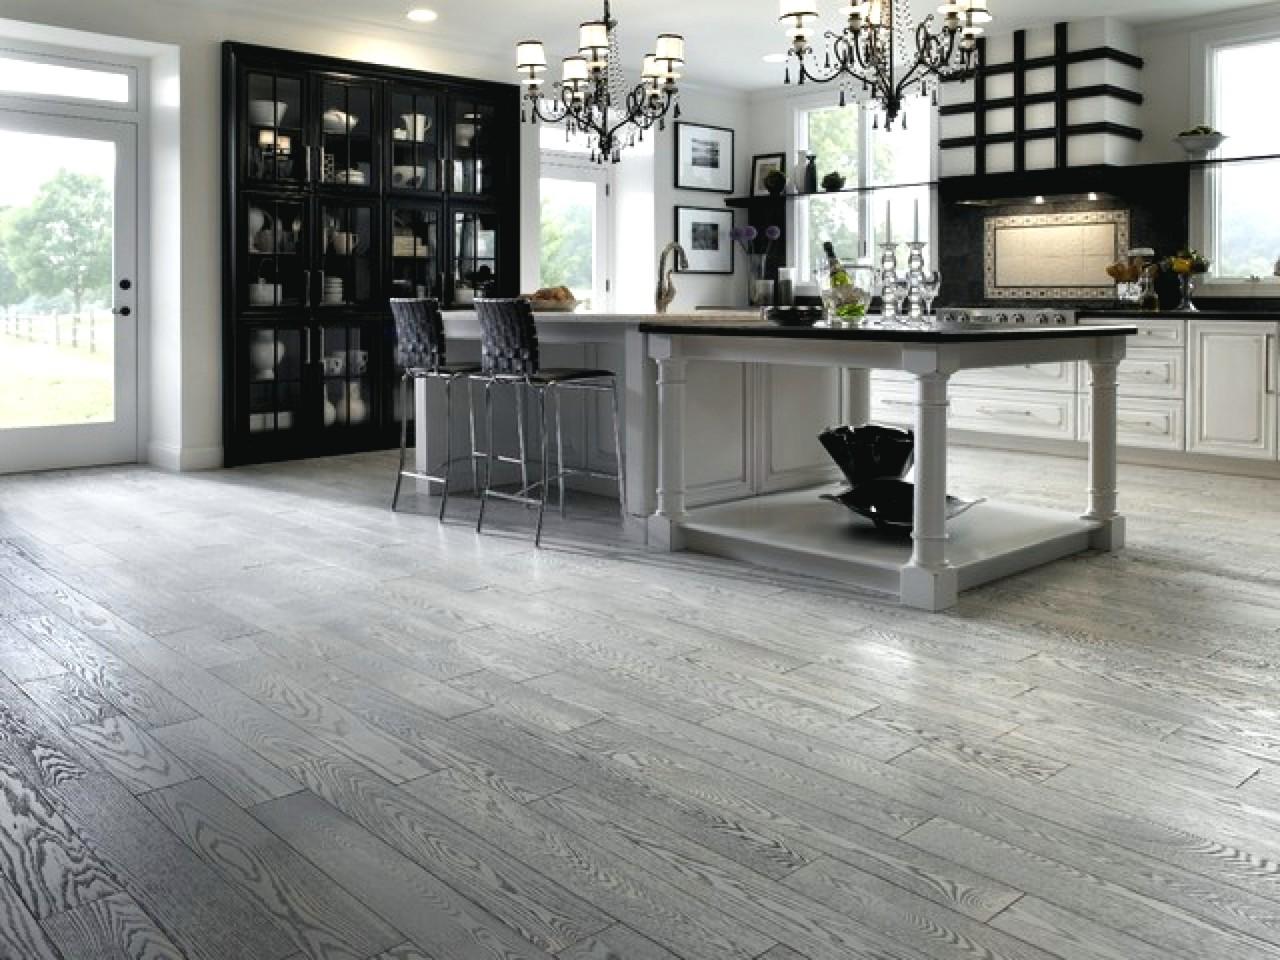 hardwood flooring colors best hardwood floor stain color gray NYVOYEY